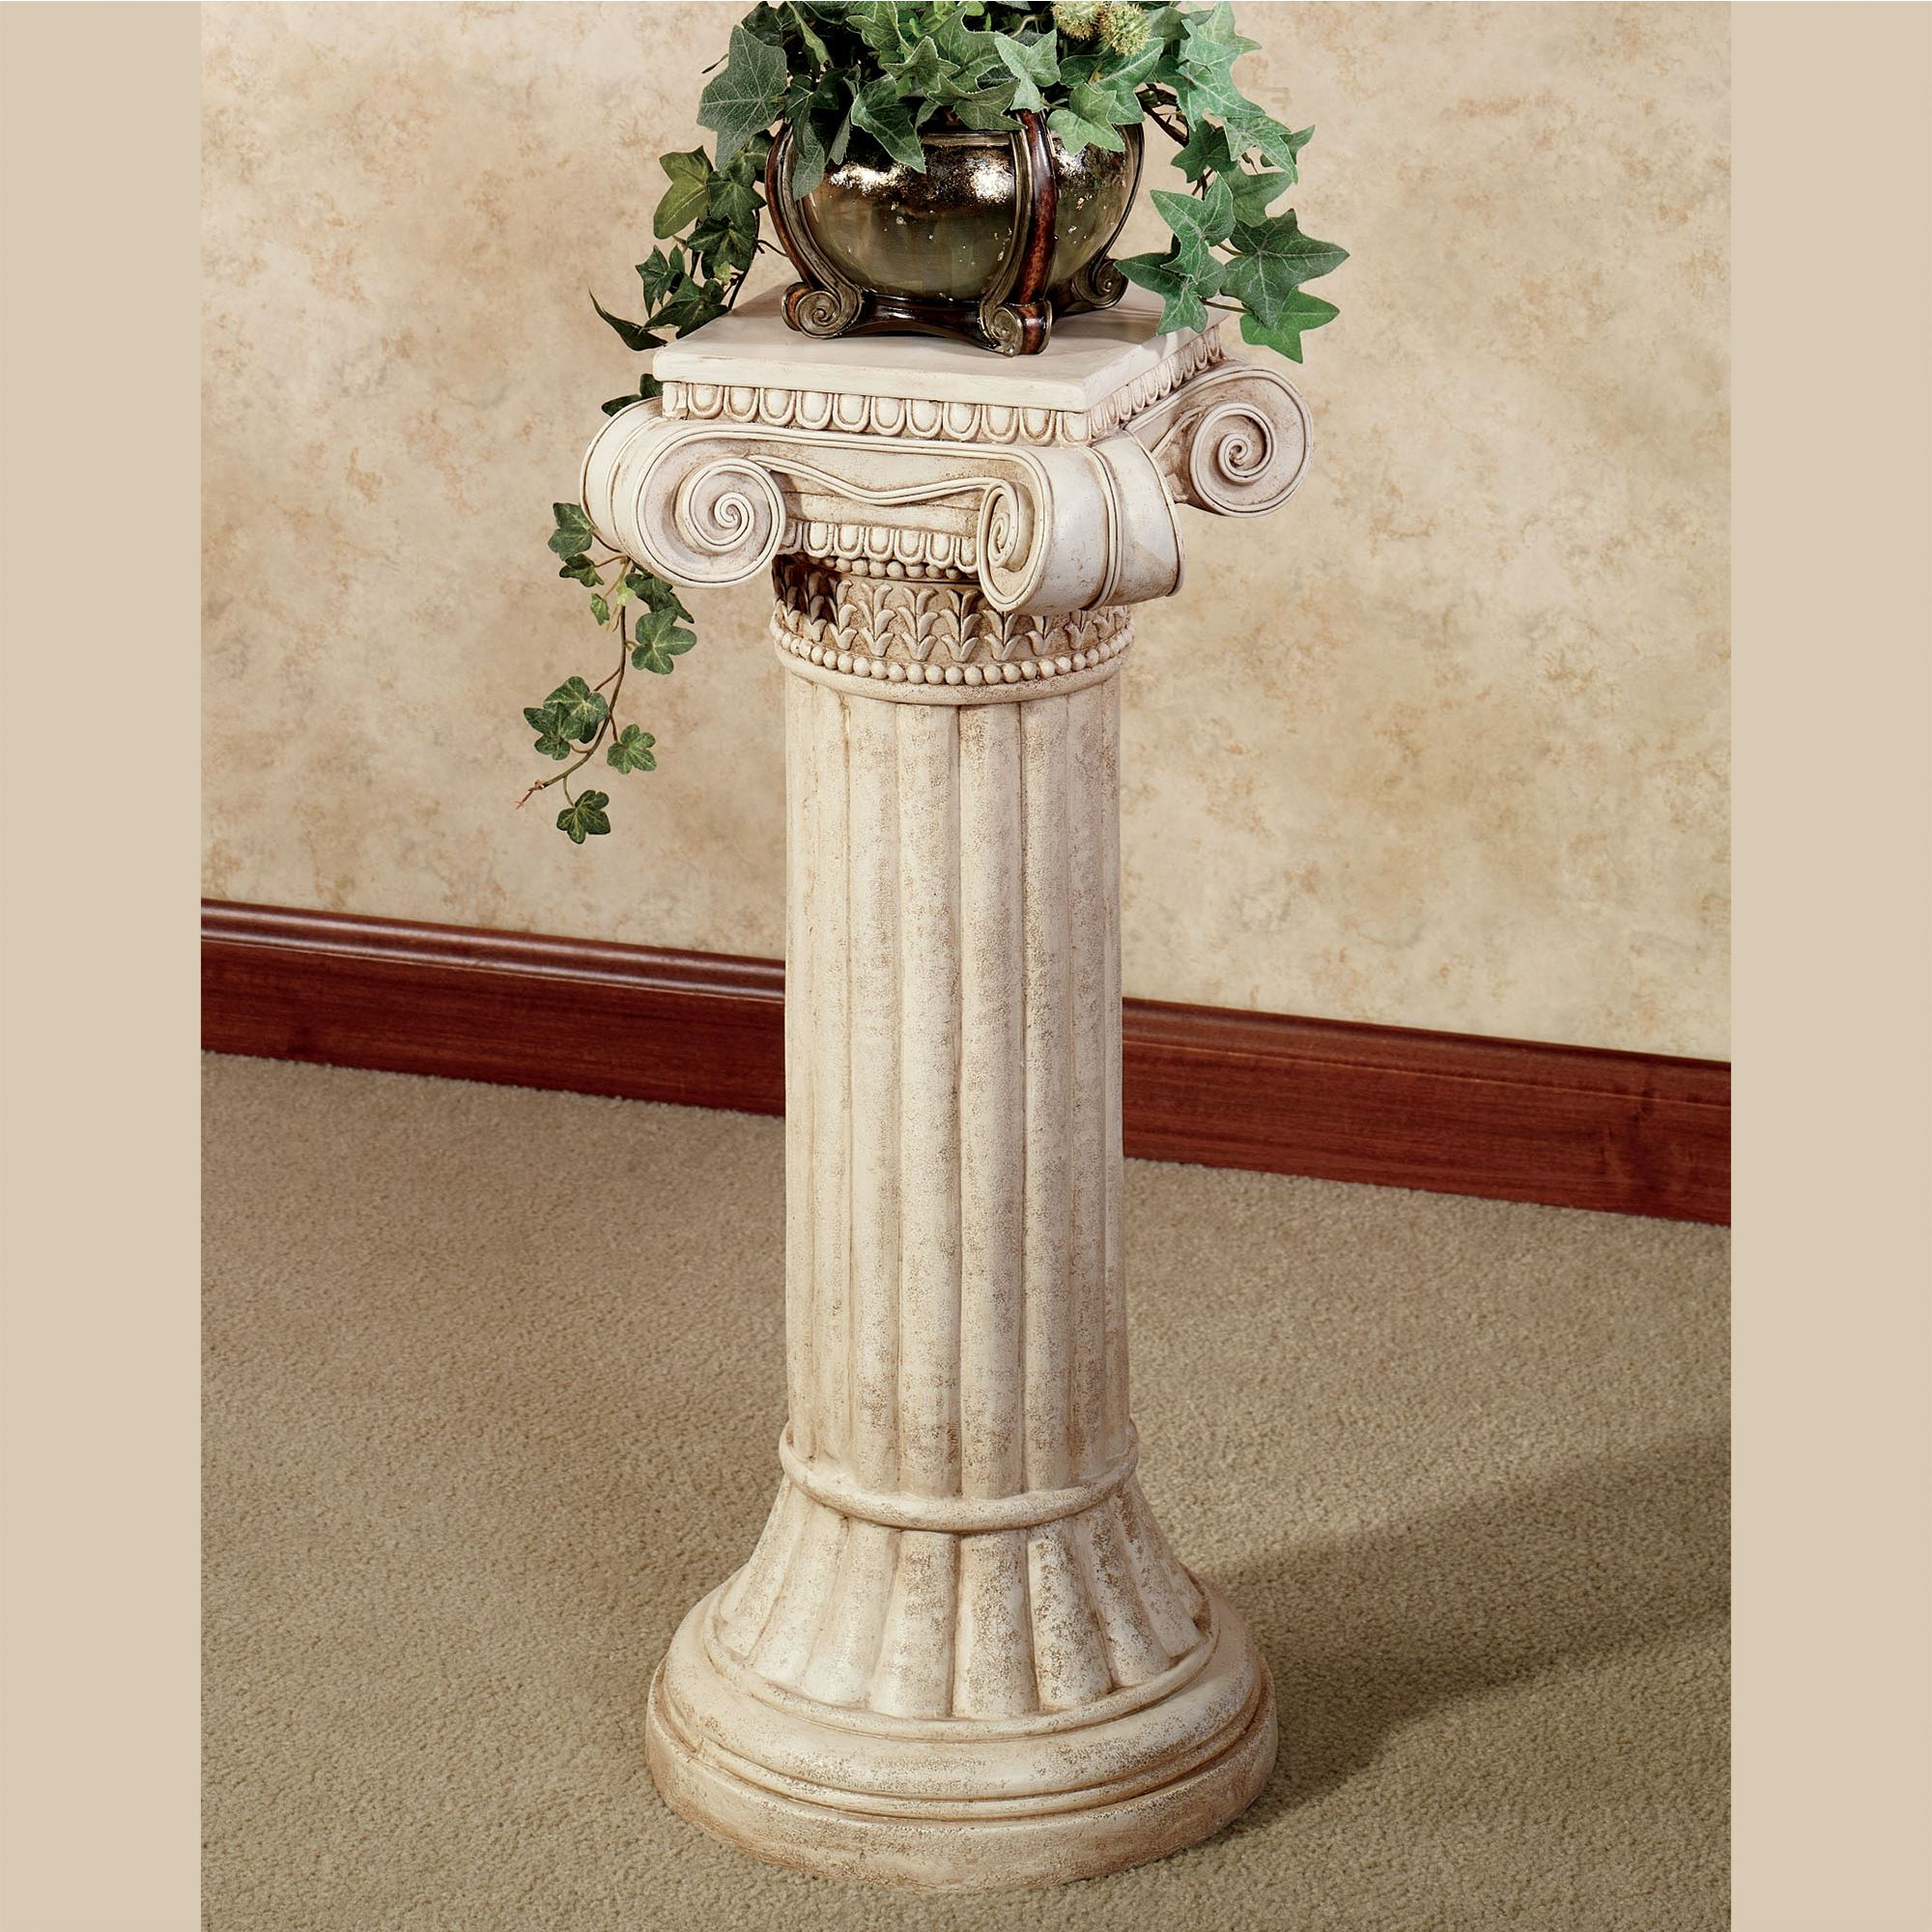 Three Posts Classic Horizontal Wall Décor Reviews: Ionic Indoor Outdoor Pedestal Column